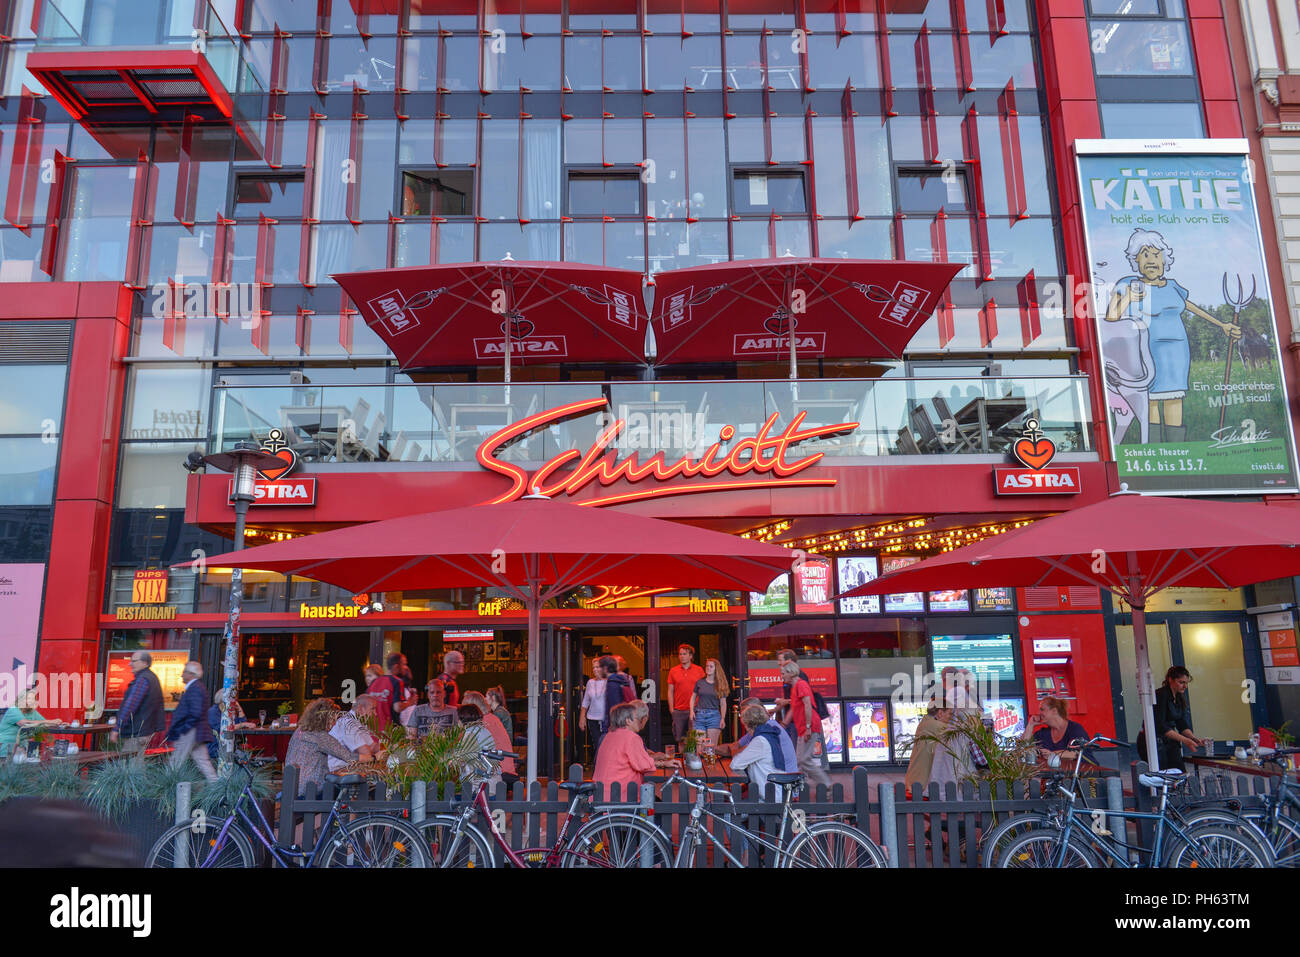 Schmidt Theater, Spielbudenplatz, Reeperbahn, St. Pauli, Hamburg, Deutschland Stock Photo